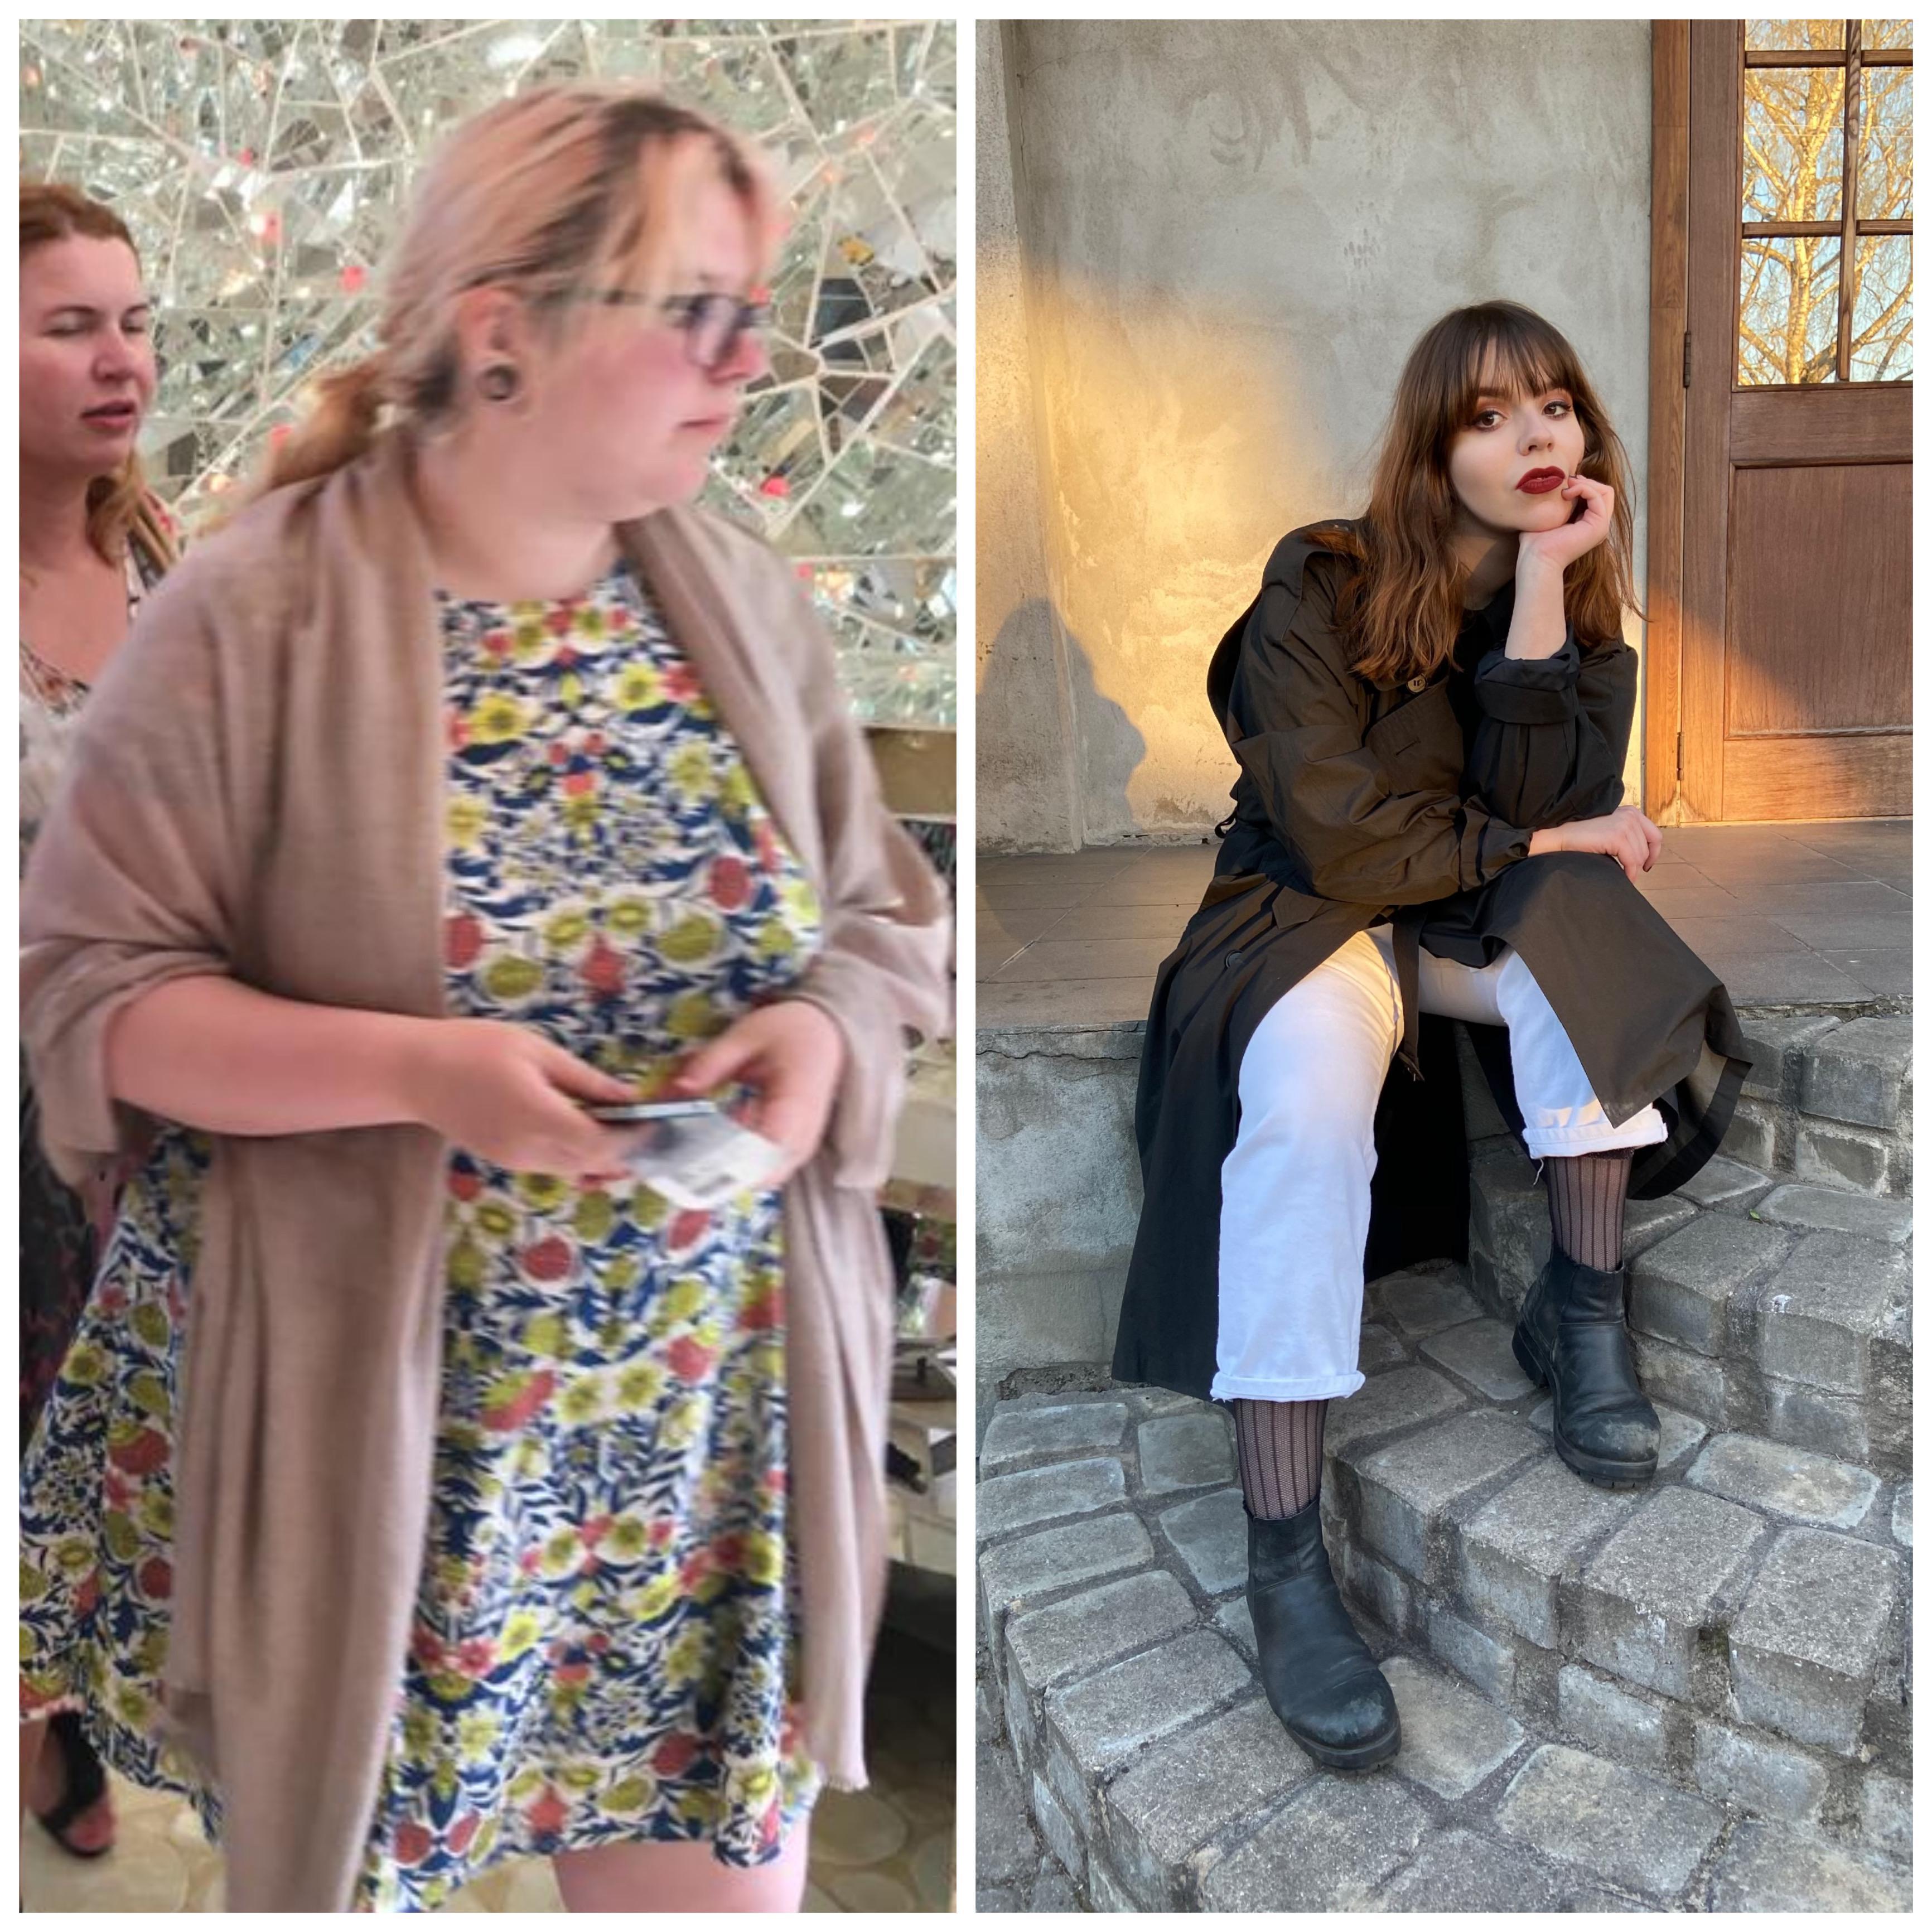 Progress Pics of 71 lbs Weight Loss 5'7 Female 251 lbs to 180 lbs